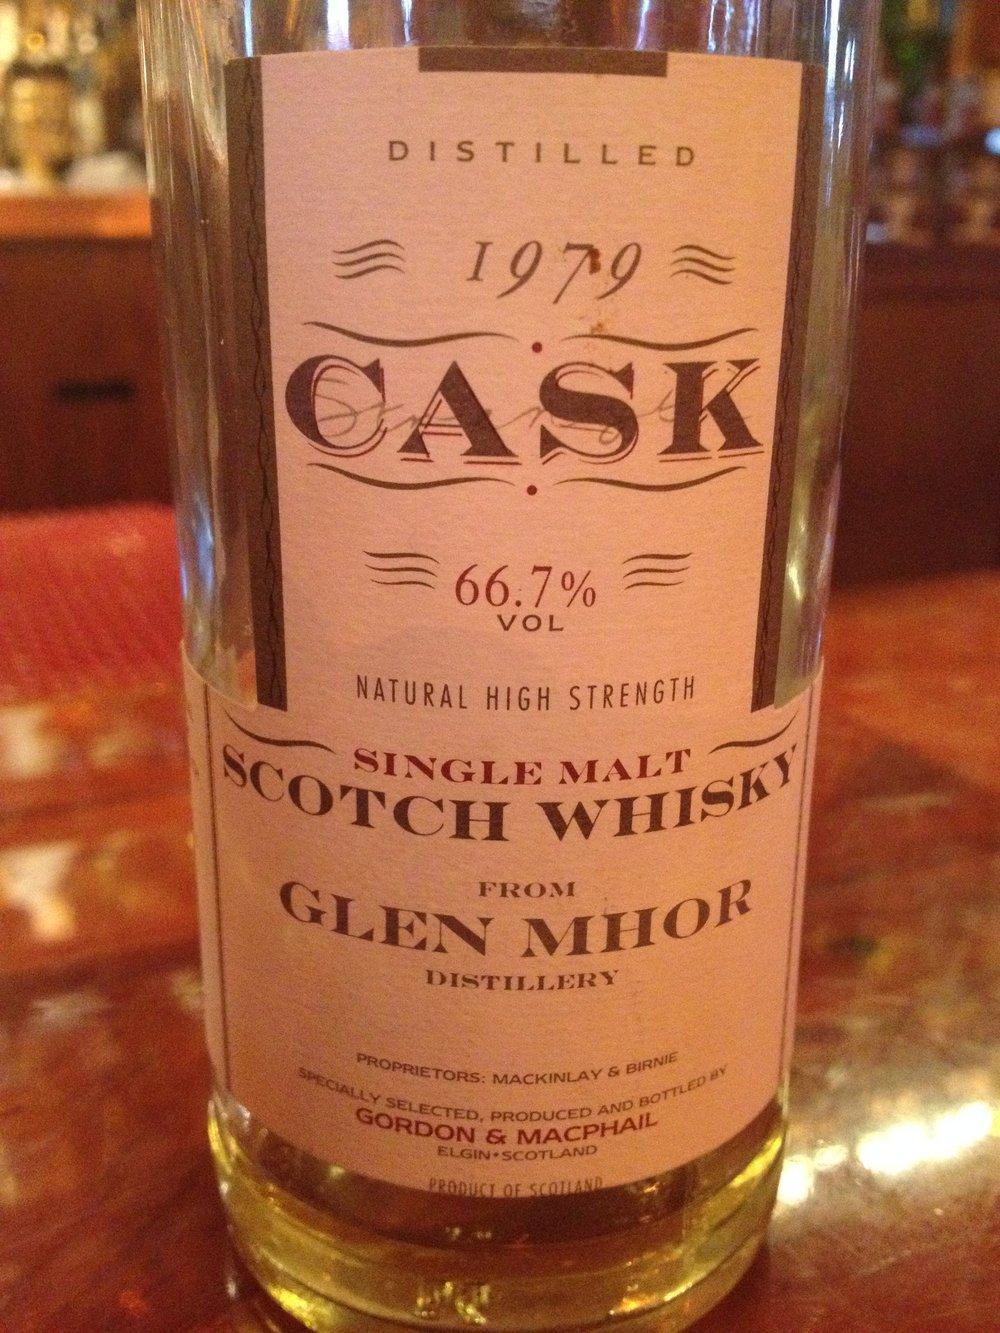 16 Year Old | 66.7% ABV - Distillery | Glen Mhor